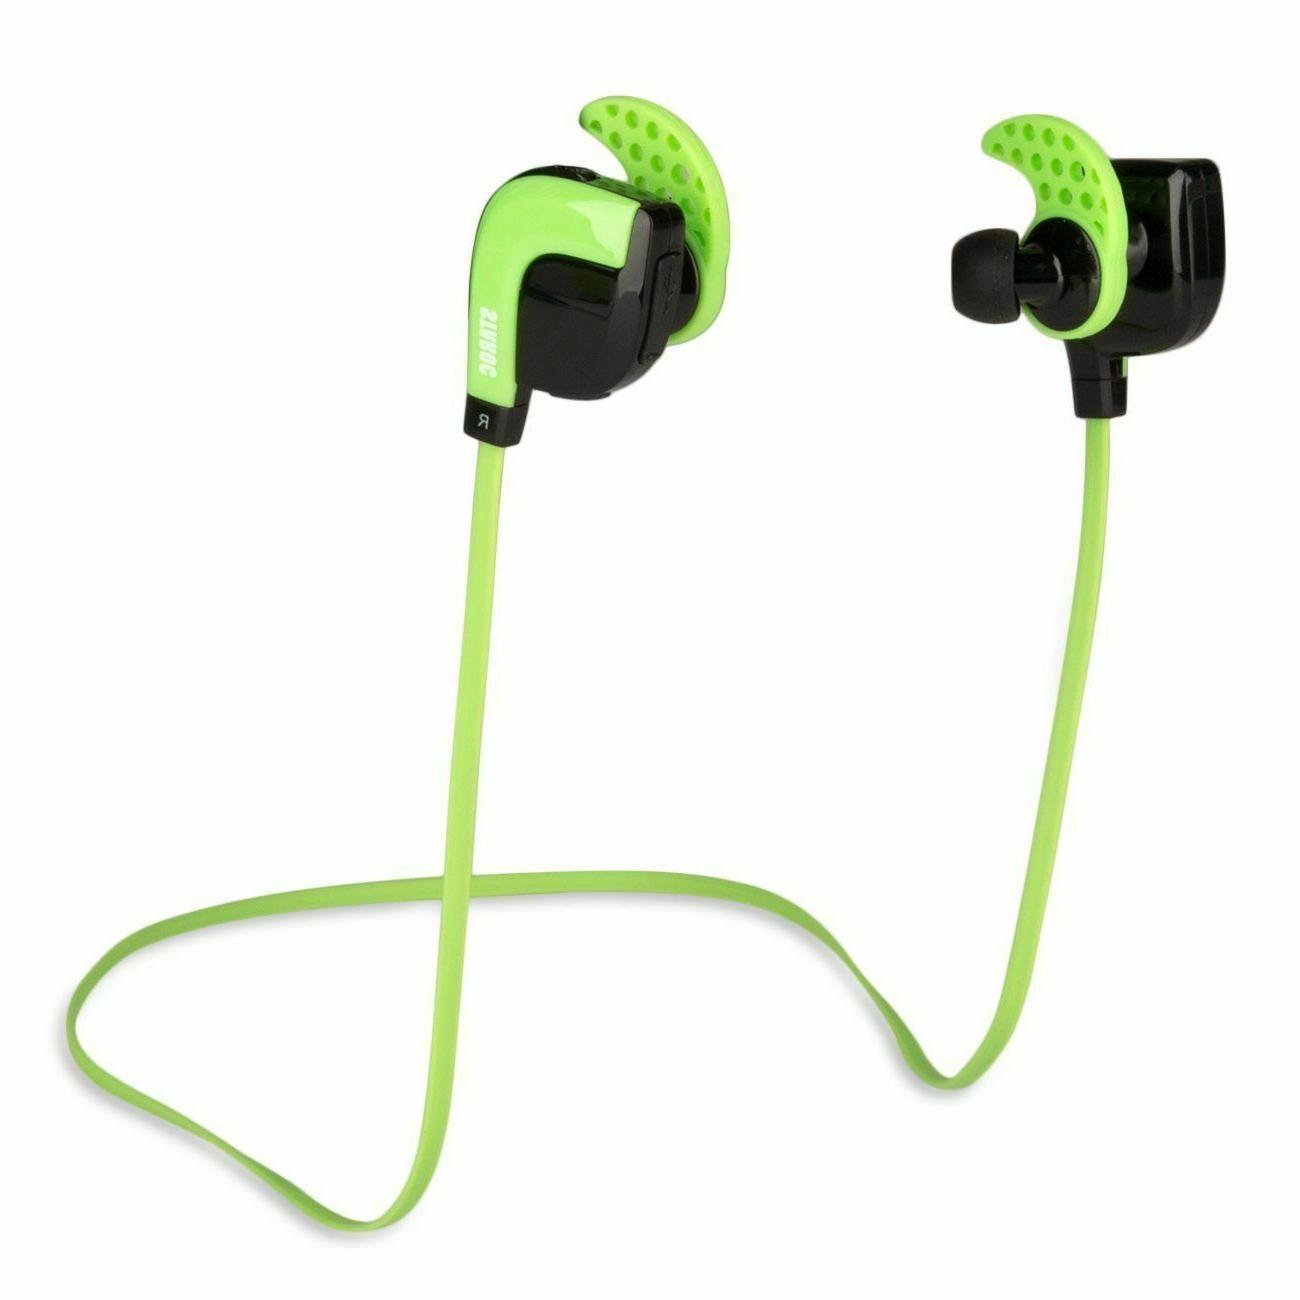 Gym Running Bluetooth Jogging Wireless Sport Earbuds Headset